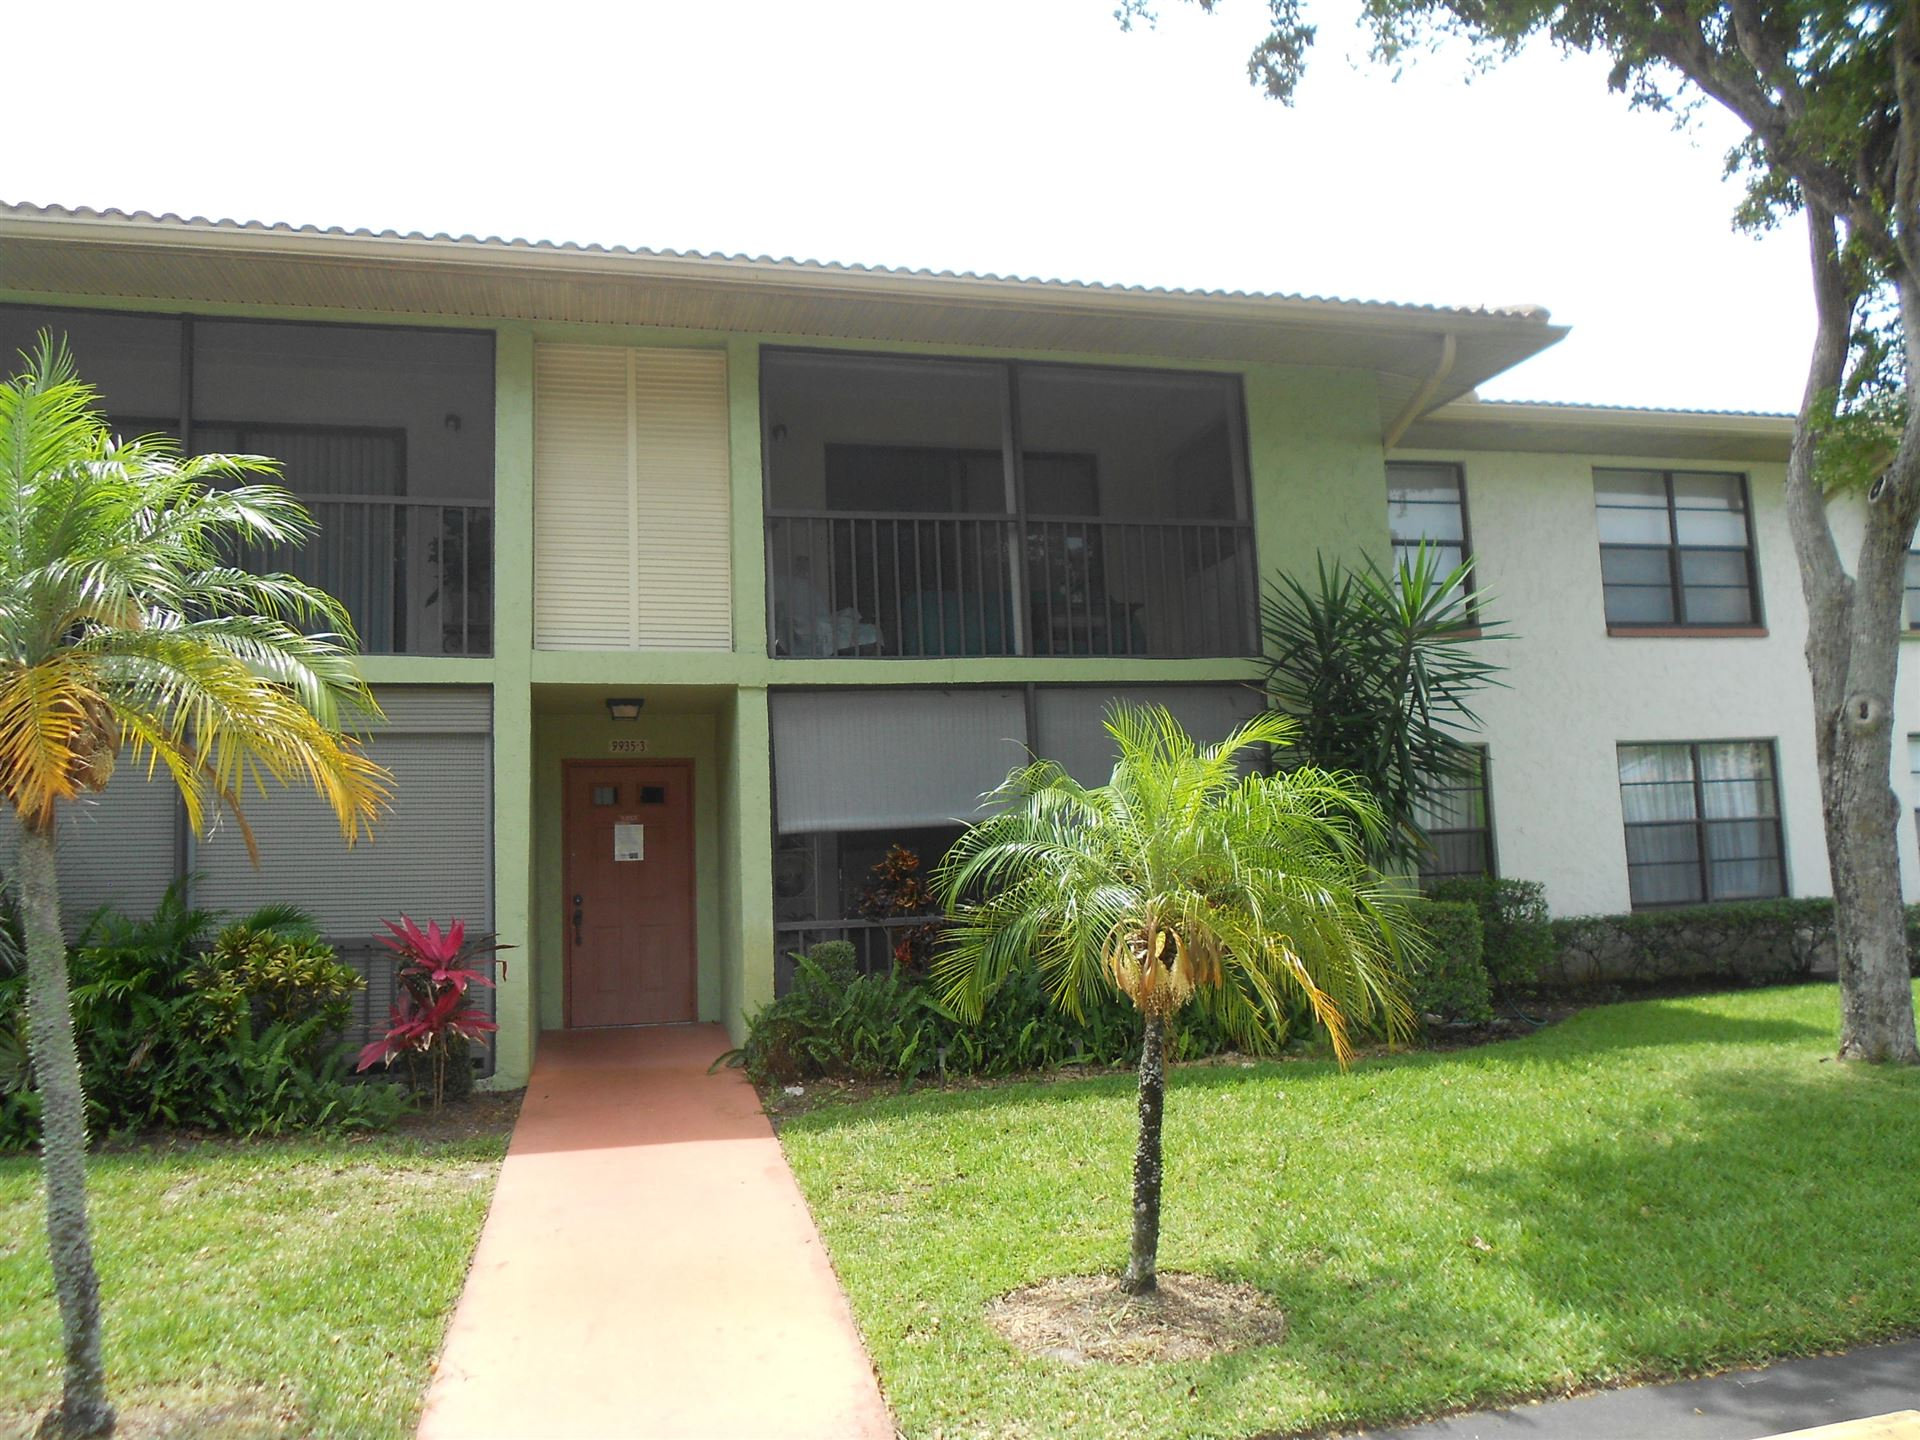 Photo of 9935 Pineapple Tree Drive #204, Boynton Beach, FL 33436 (MLS # RX-10669657)